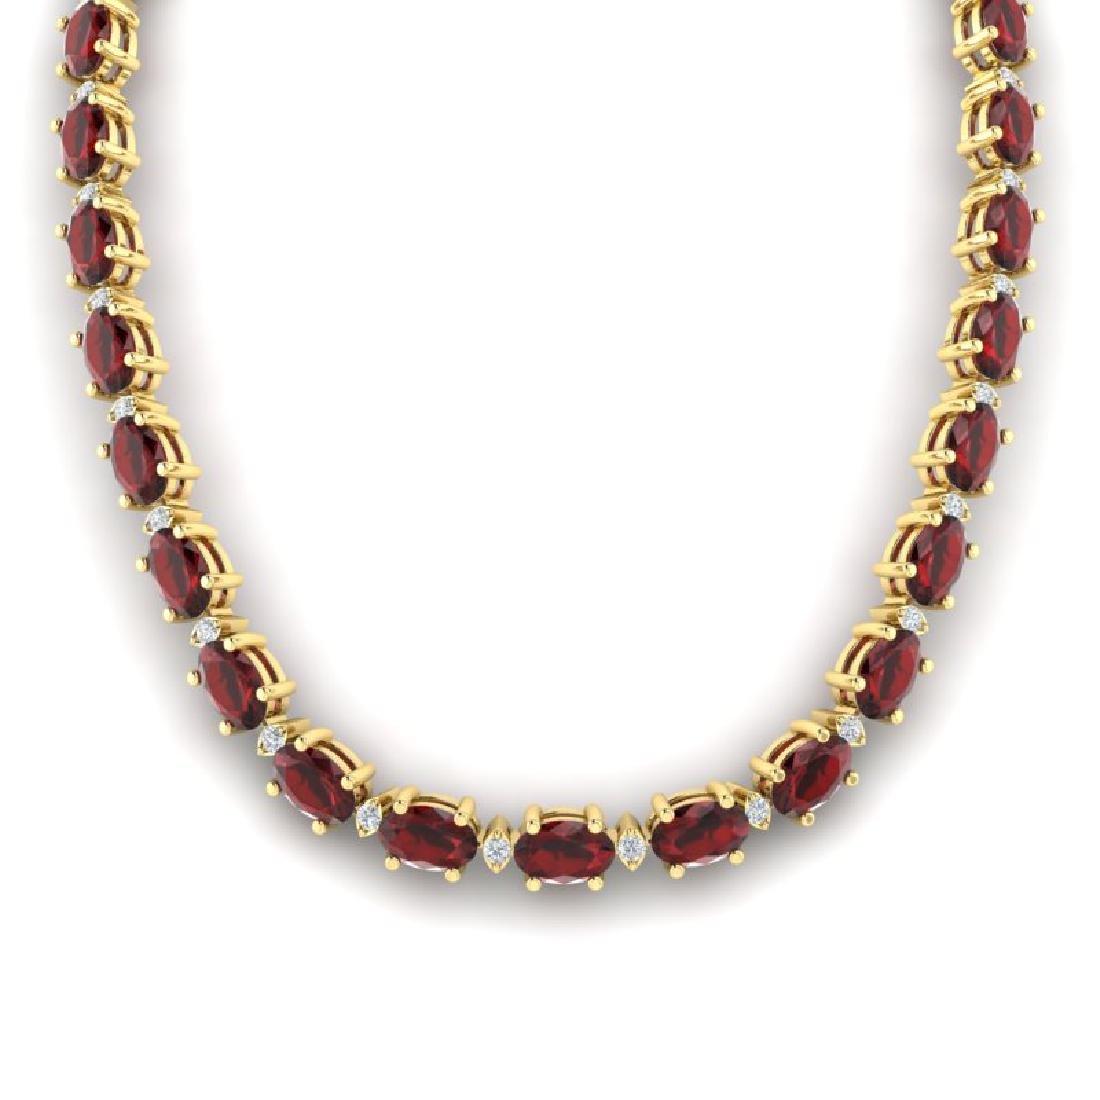 33 CTW Garnet & VS/SI Diamond Eternity Tennis Necklace - 3